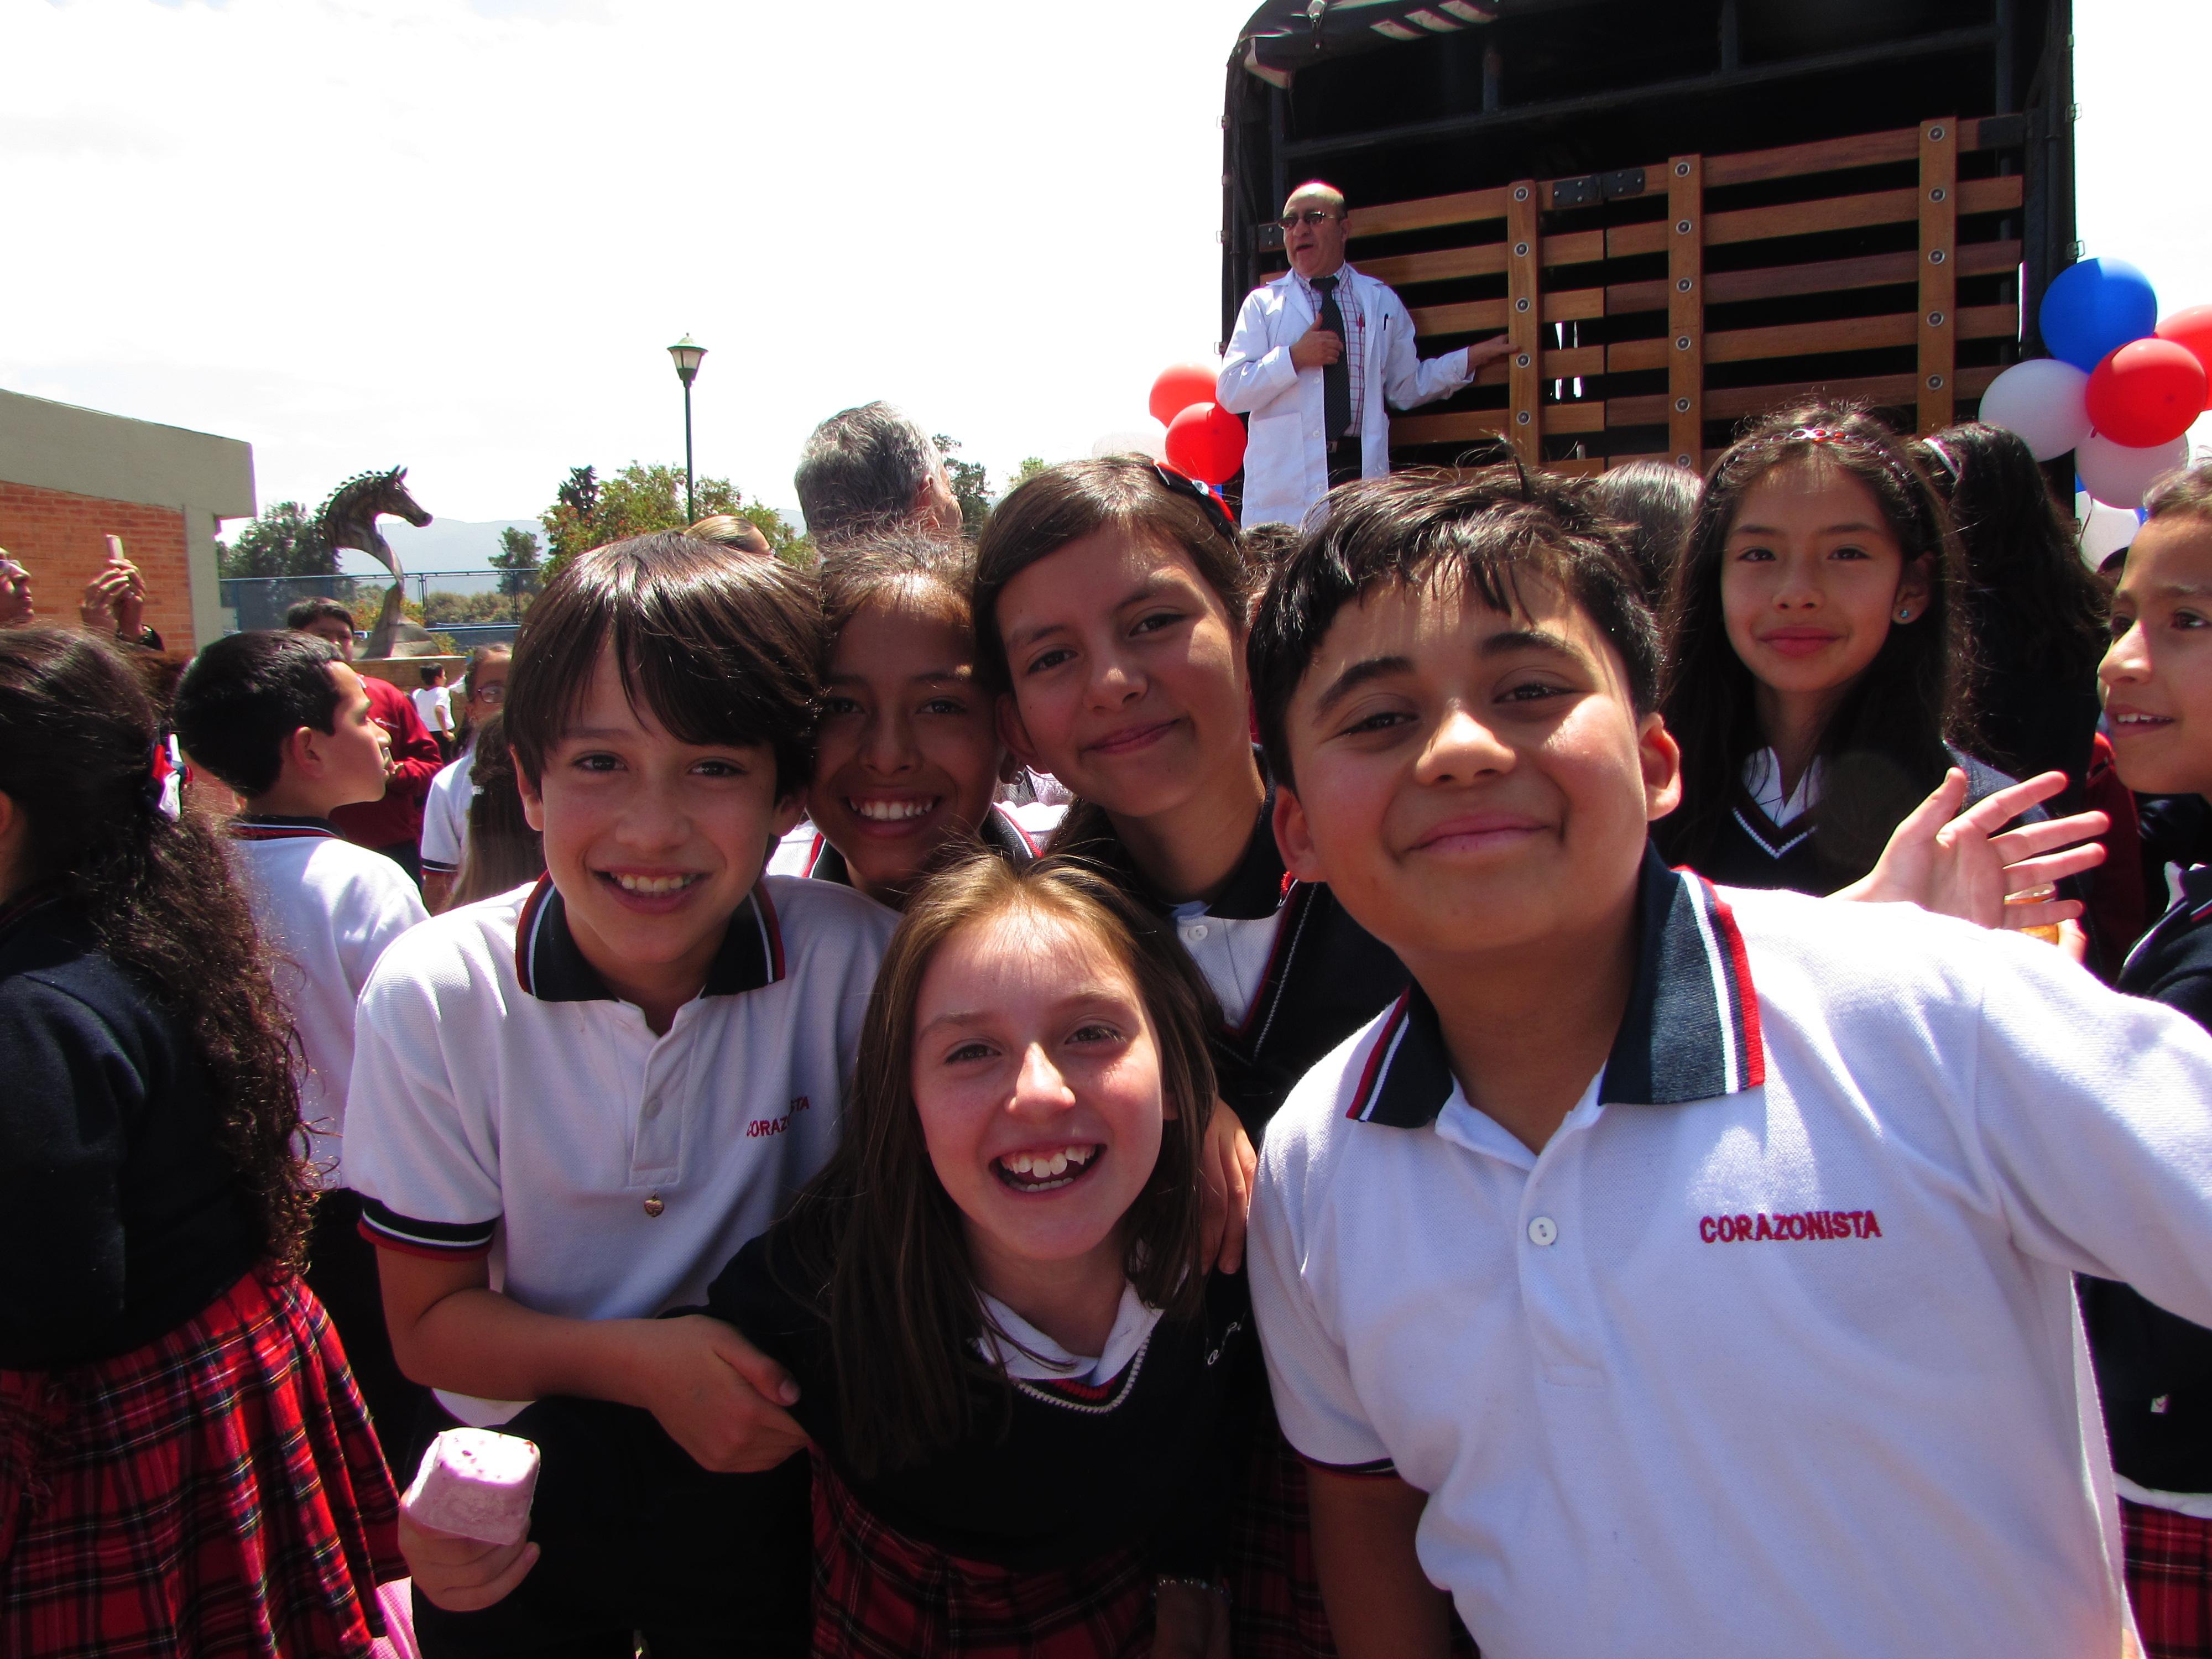 Corazonista - Bogotá